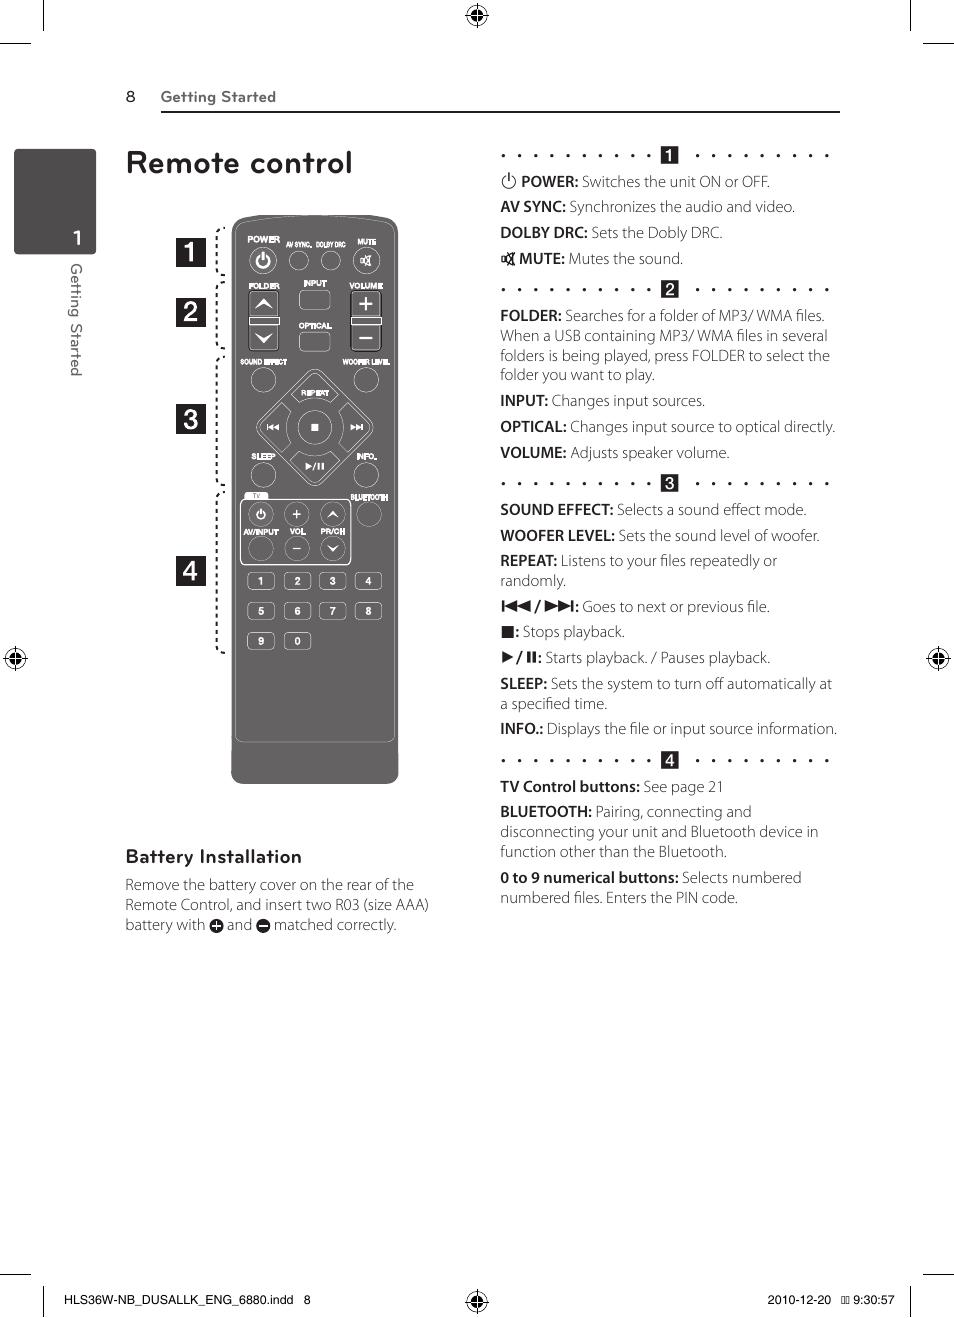 Lg Sound Bar Remote